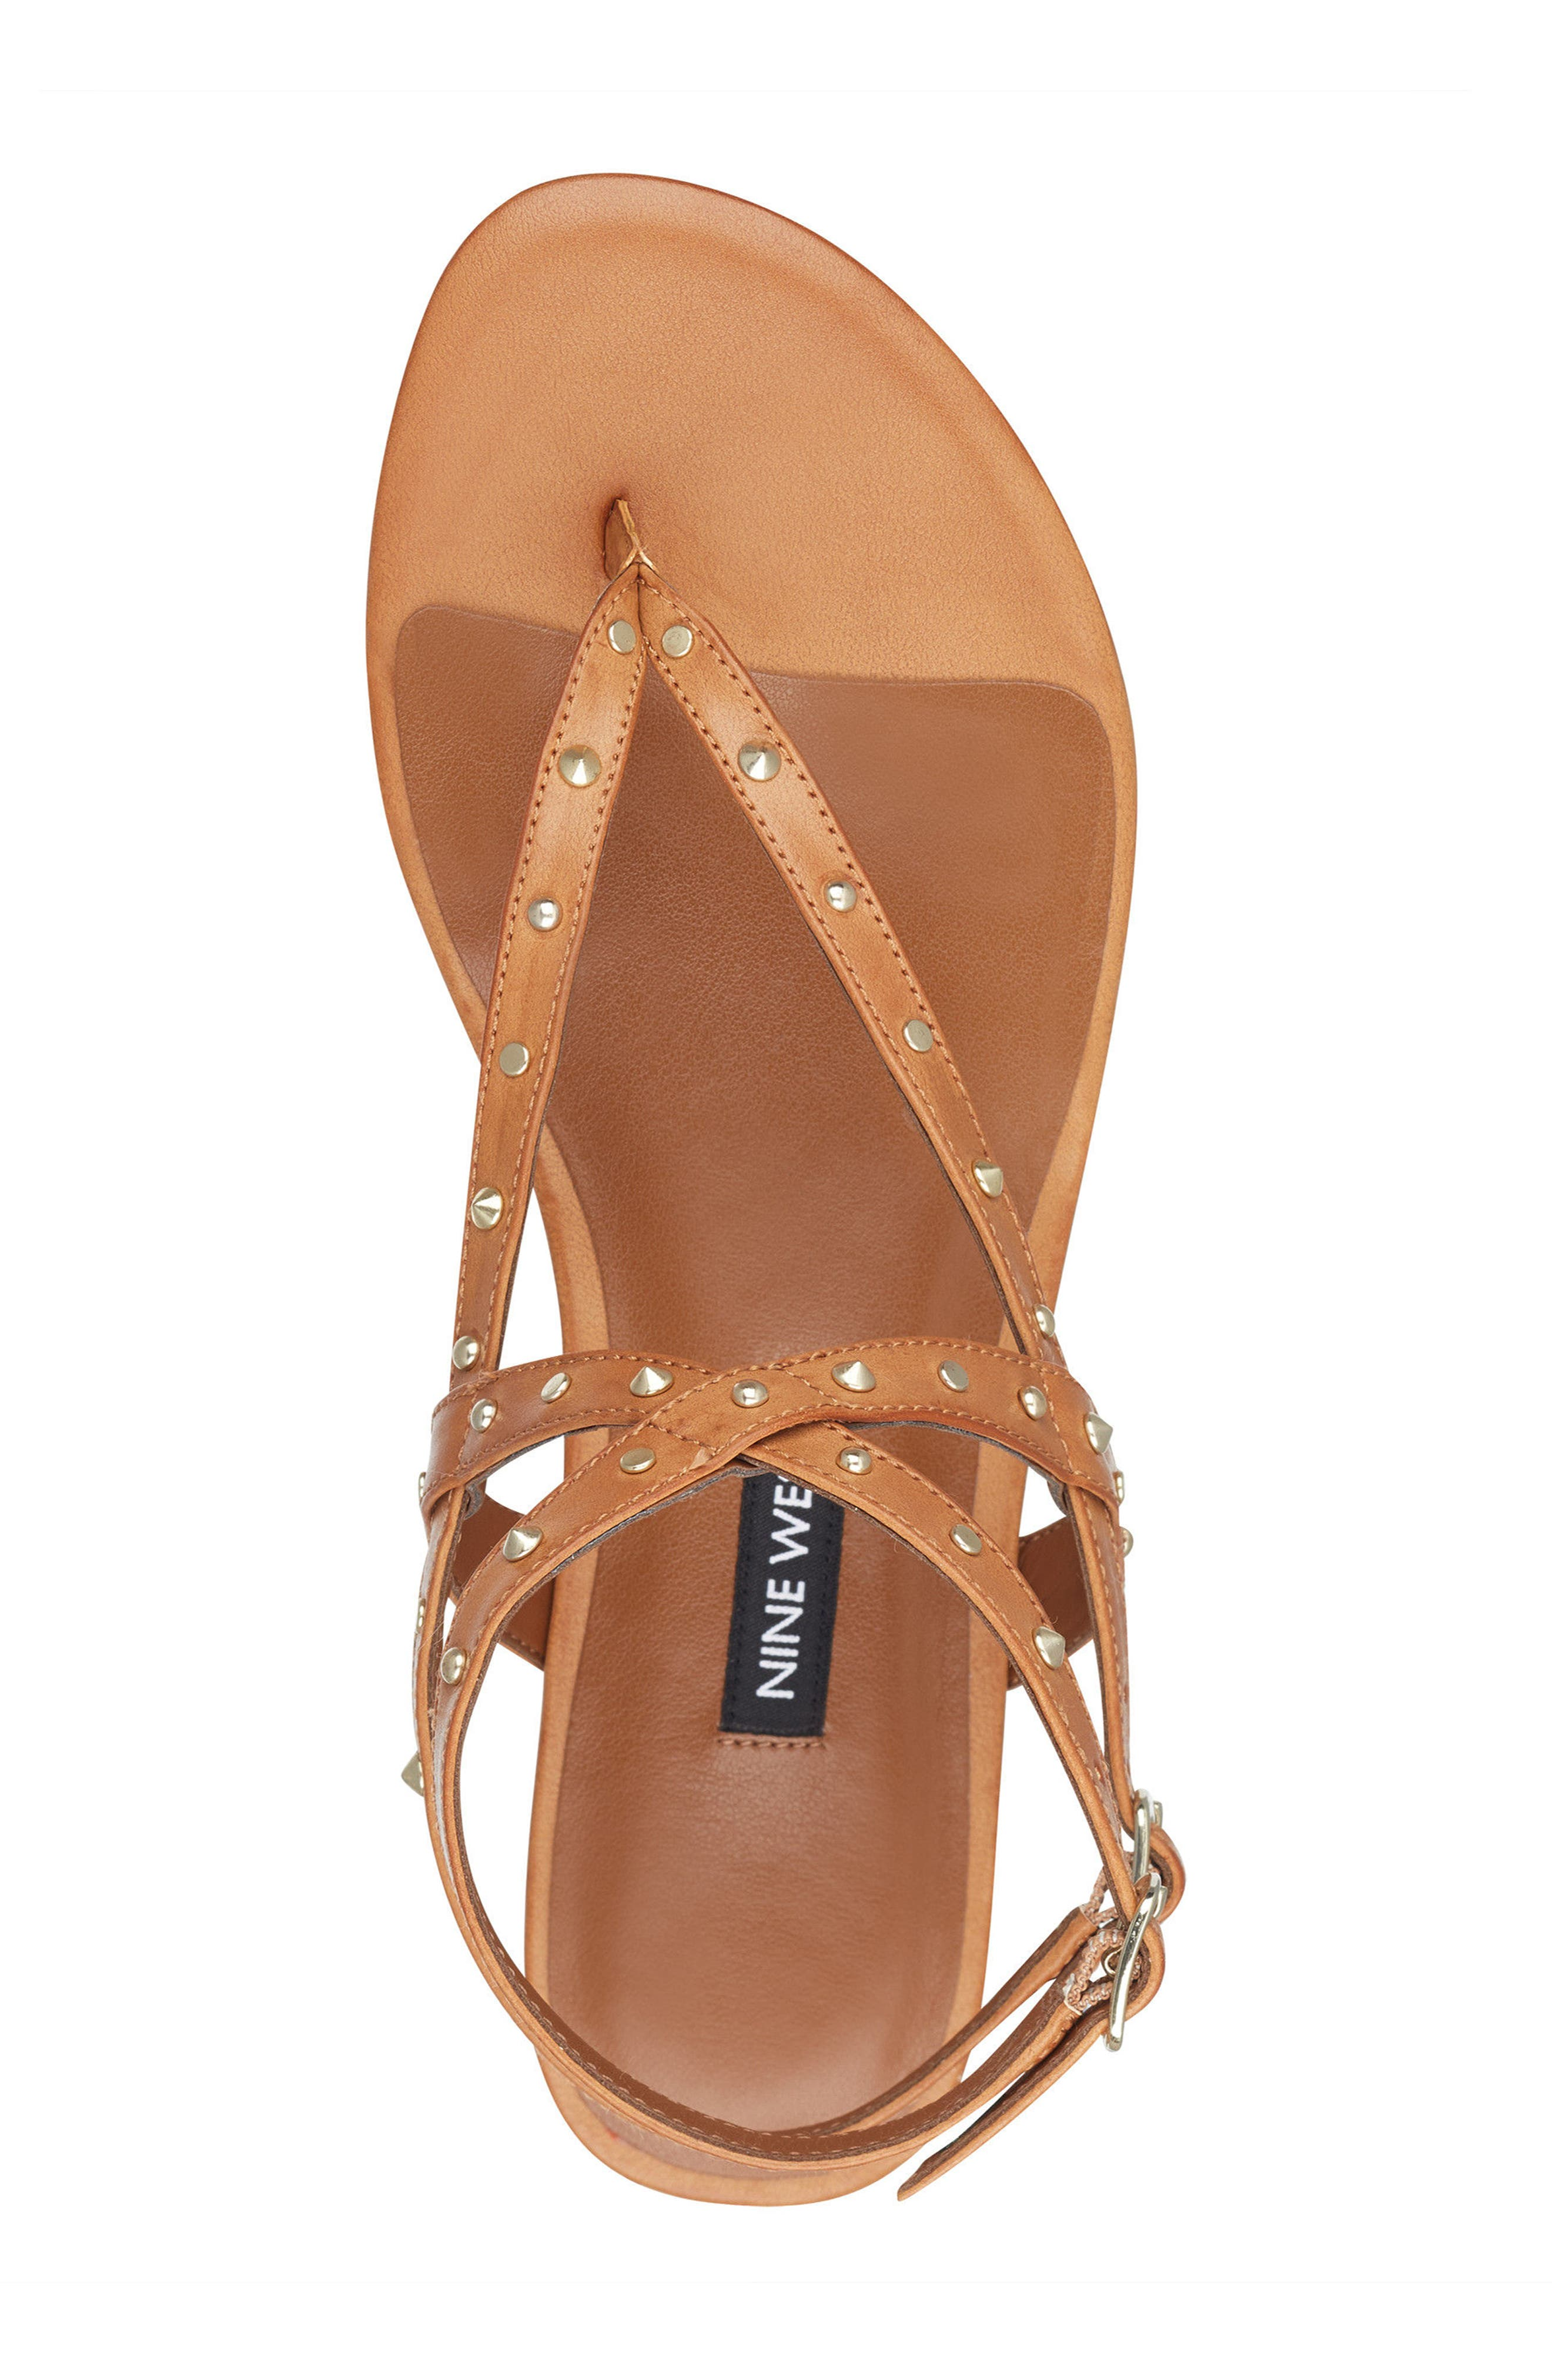 Simcha Studded Wraparound Sandal,                             Alternate thumbnail 5, color,                             Dark Natural Faux Leather